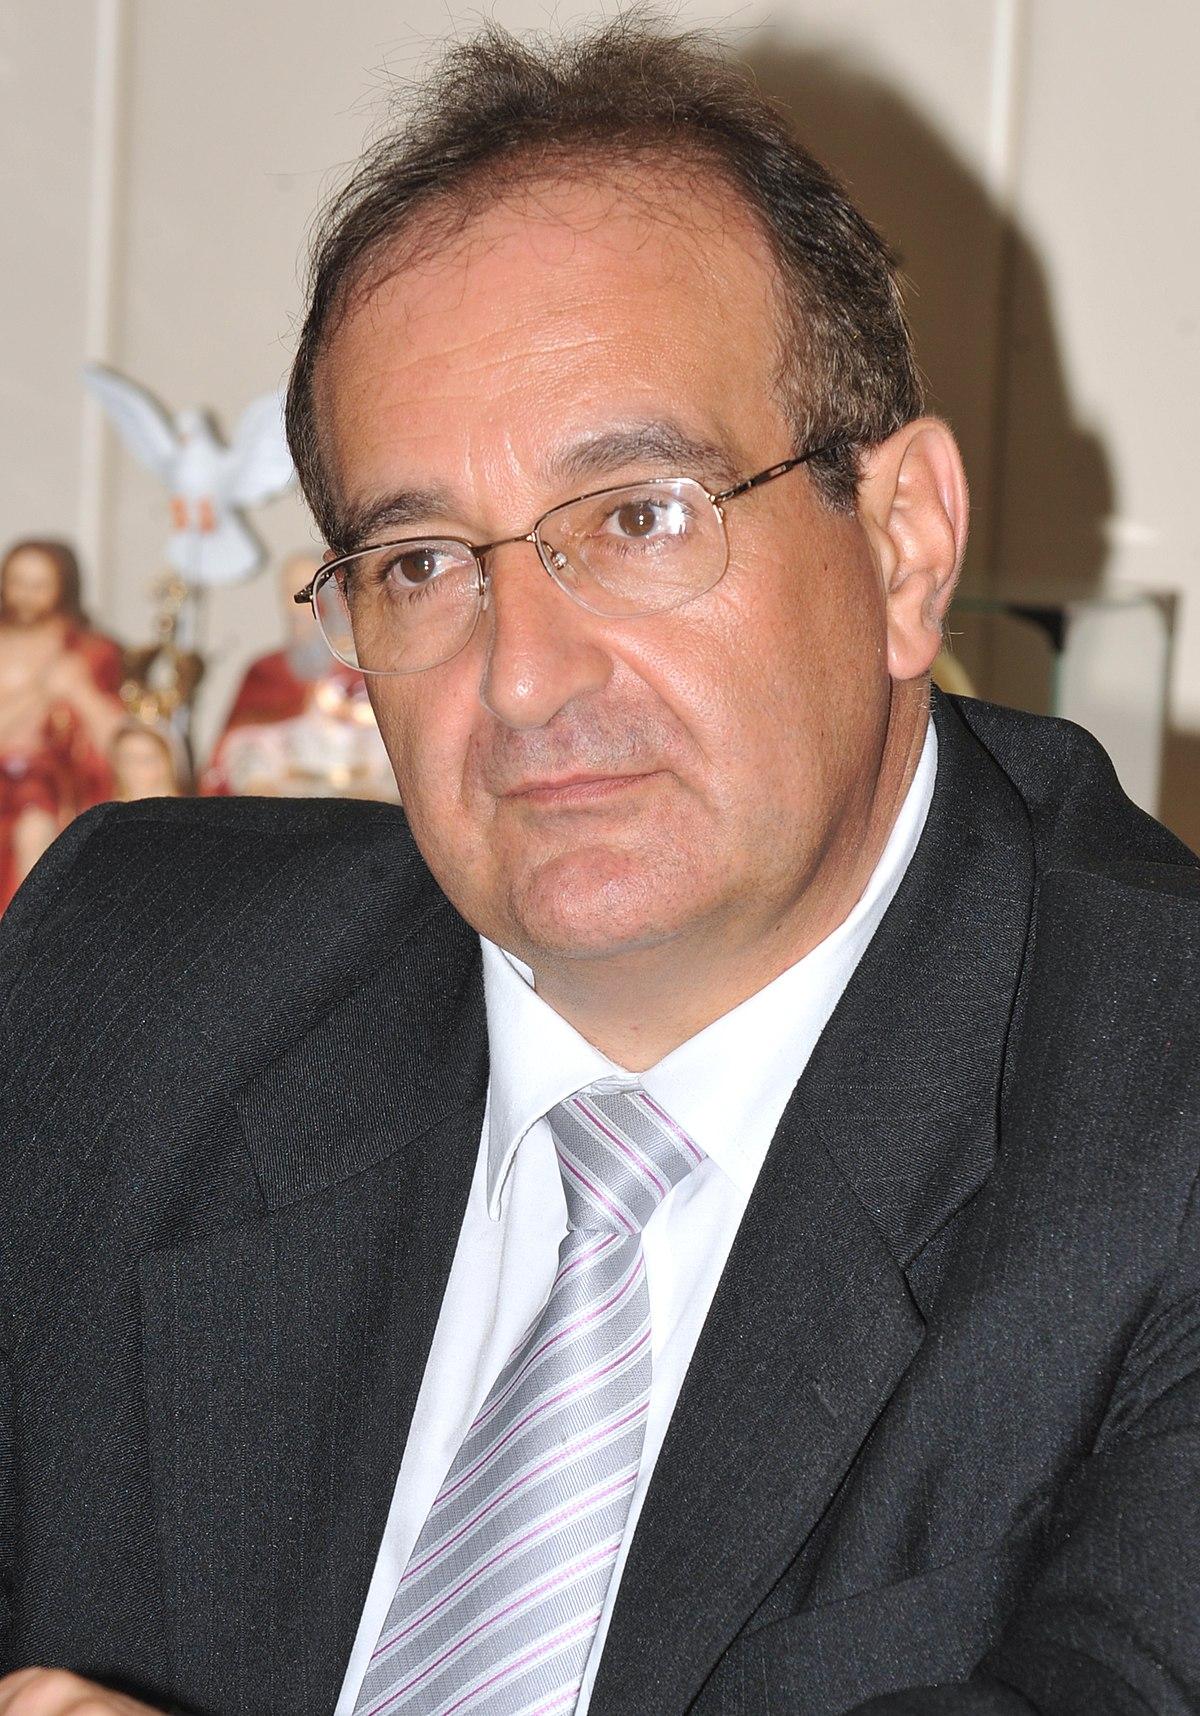 Pesidente municipal de - 1 4